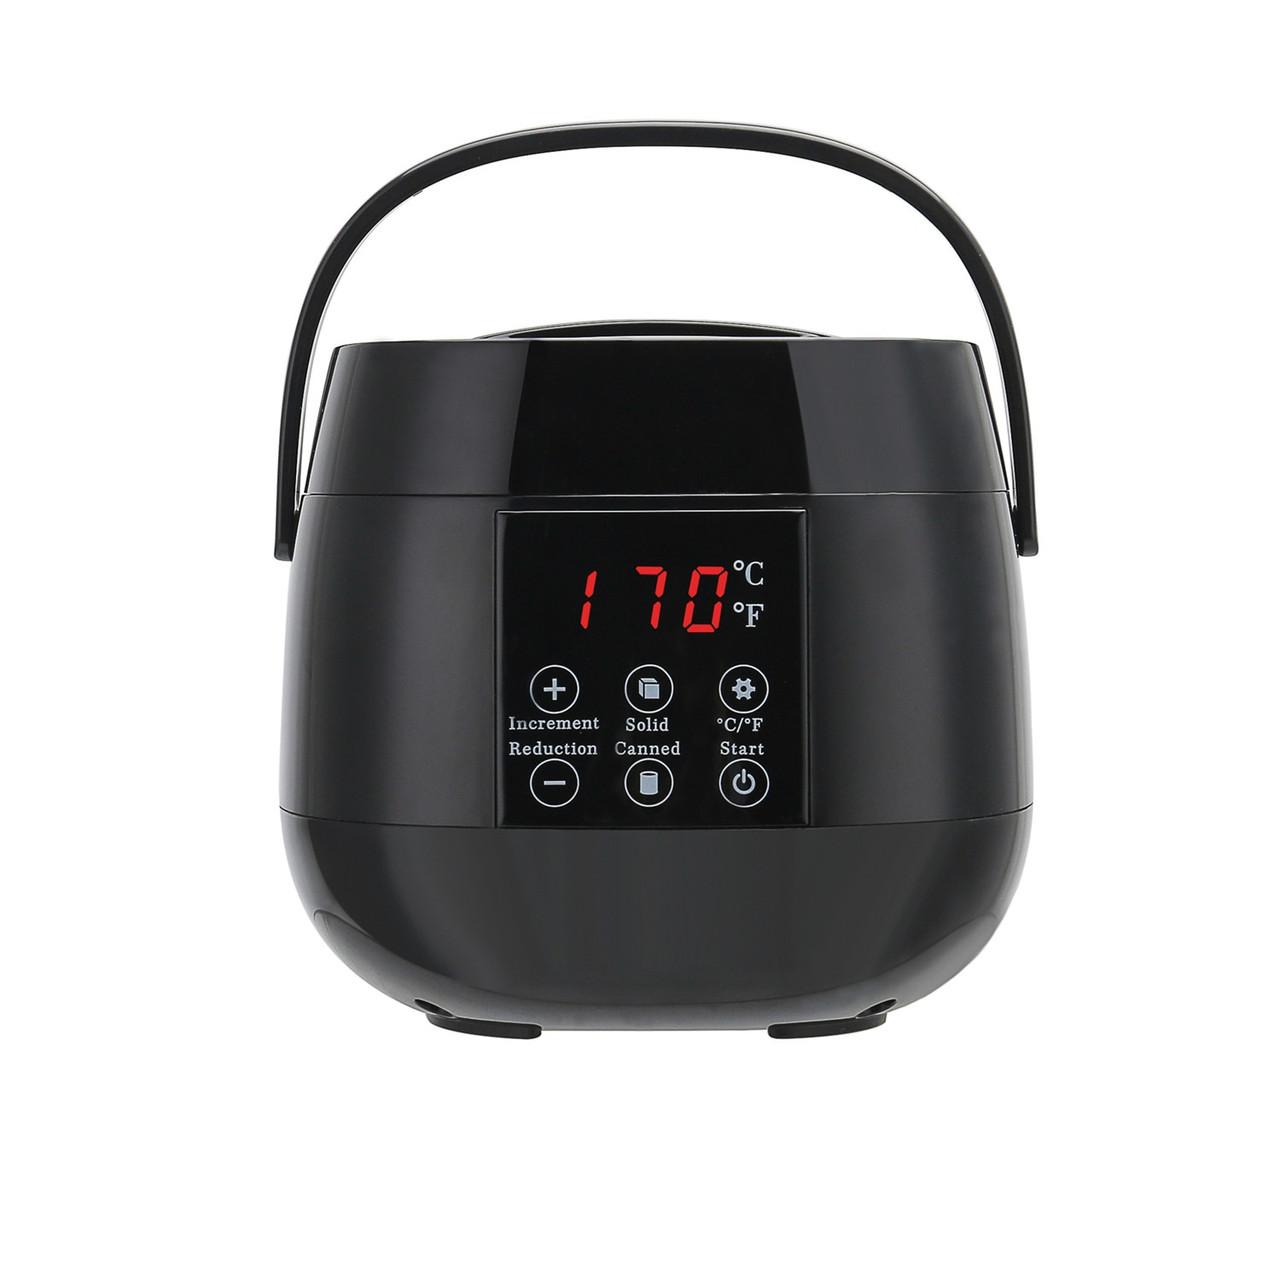 Hair Removal Tool Lcd Display Smart Wax Heater Hands Feet Epilator